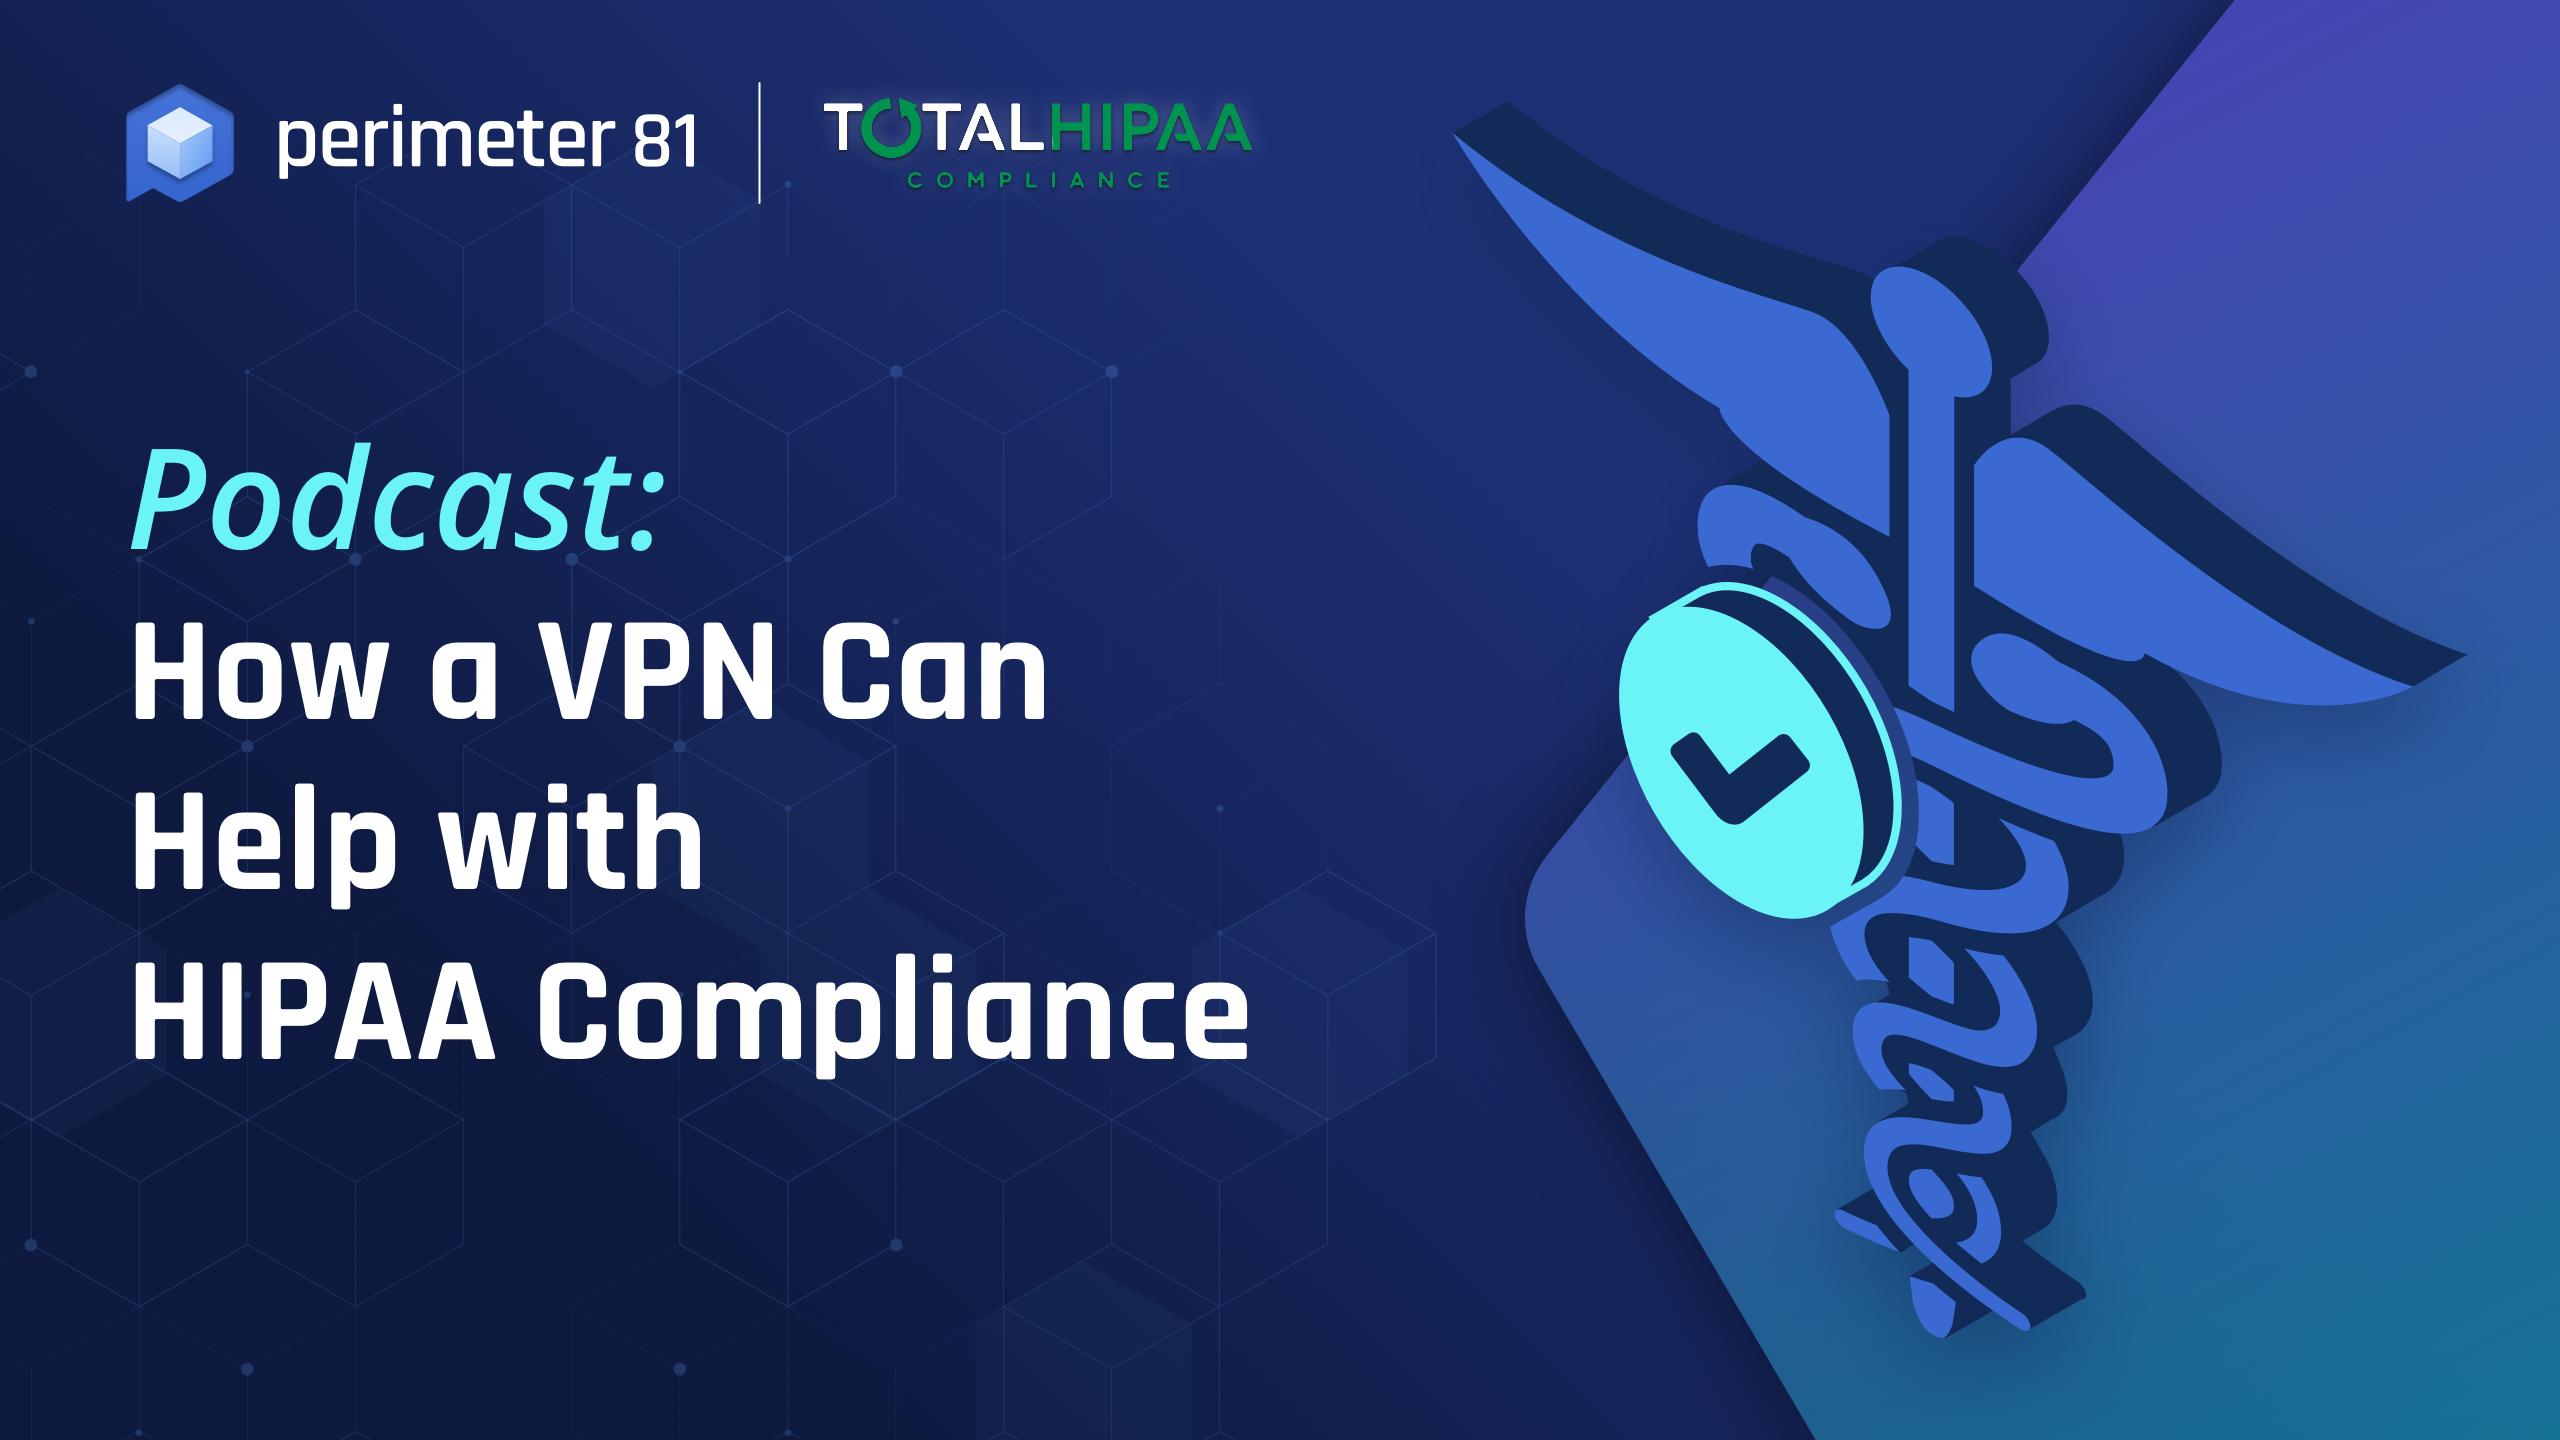 HIPPA Compliance - Perimeter 81